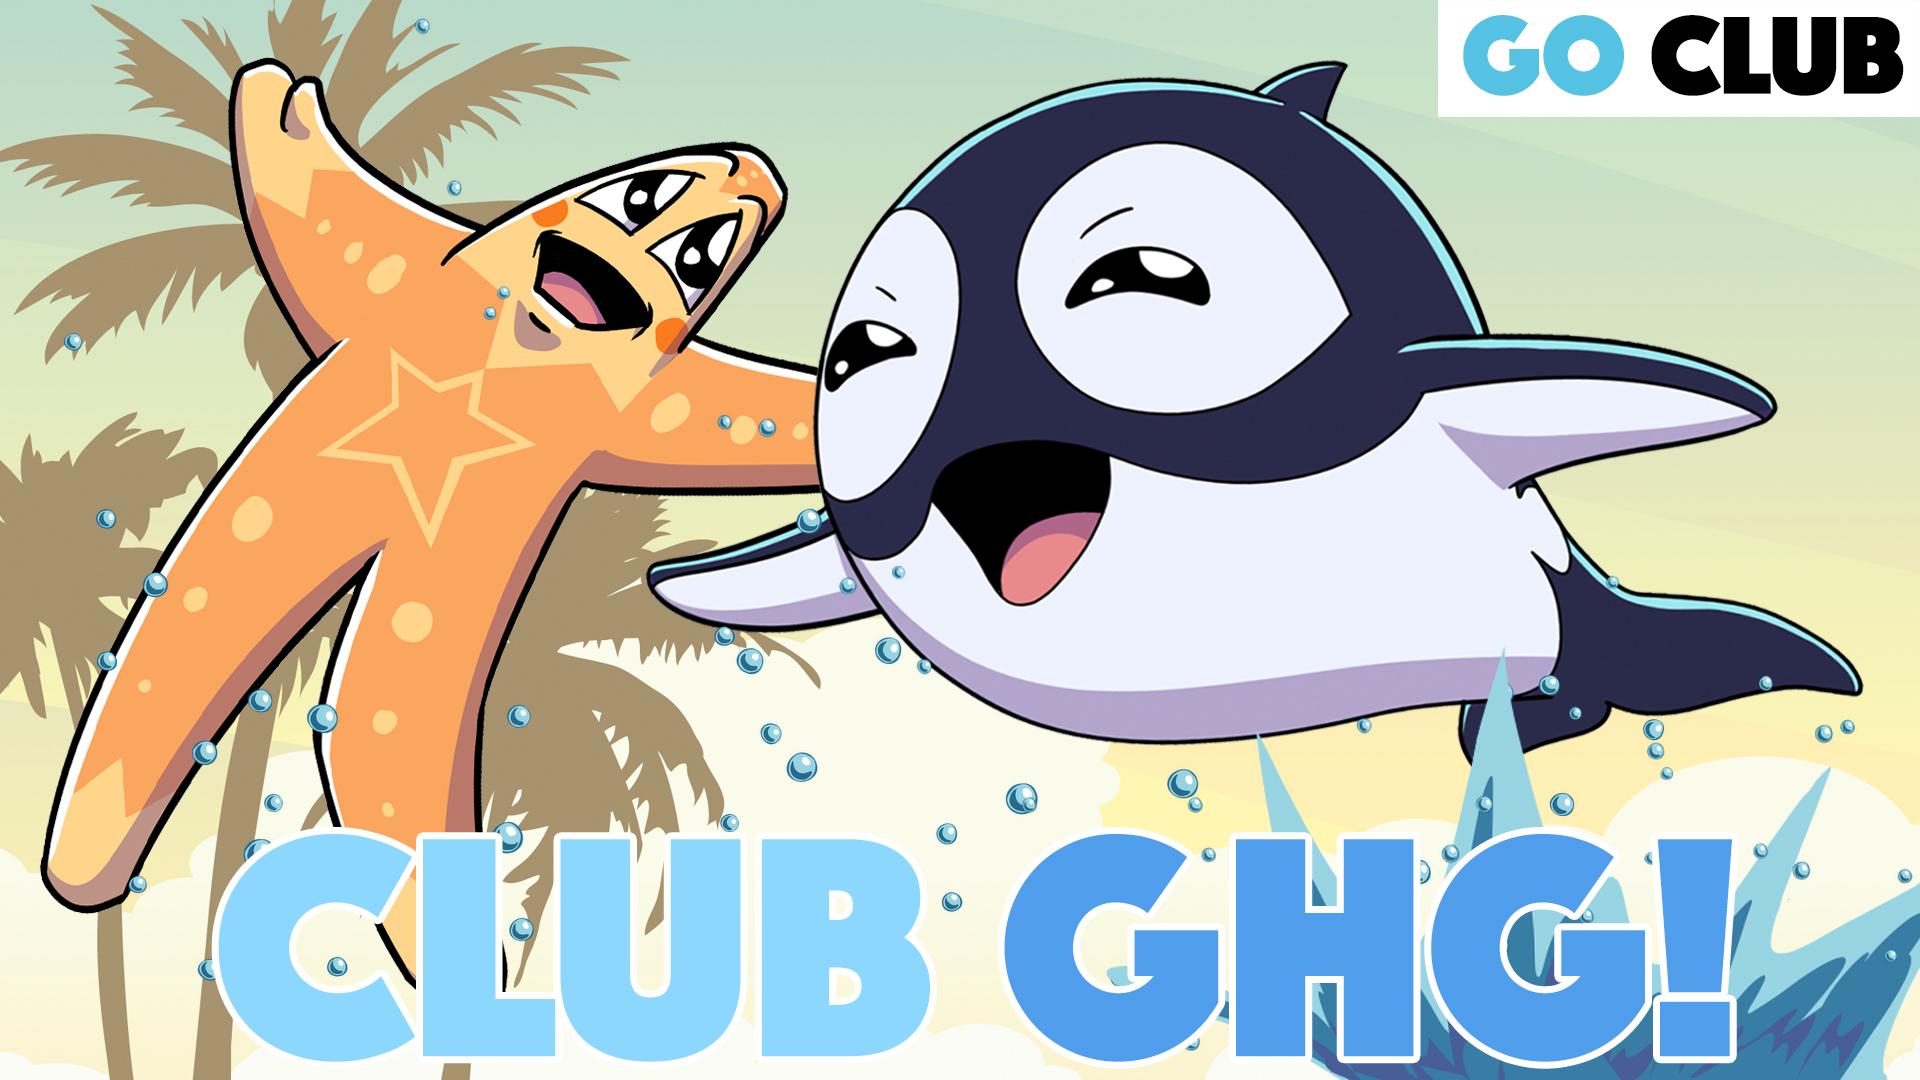 CLUB GHG!